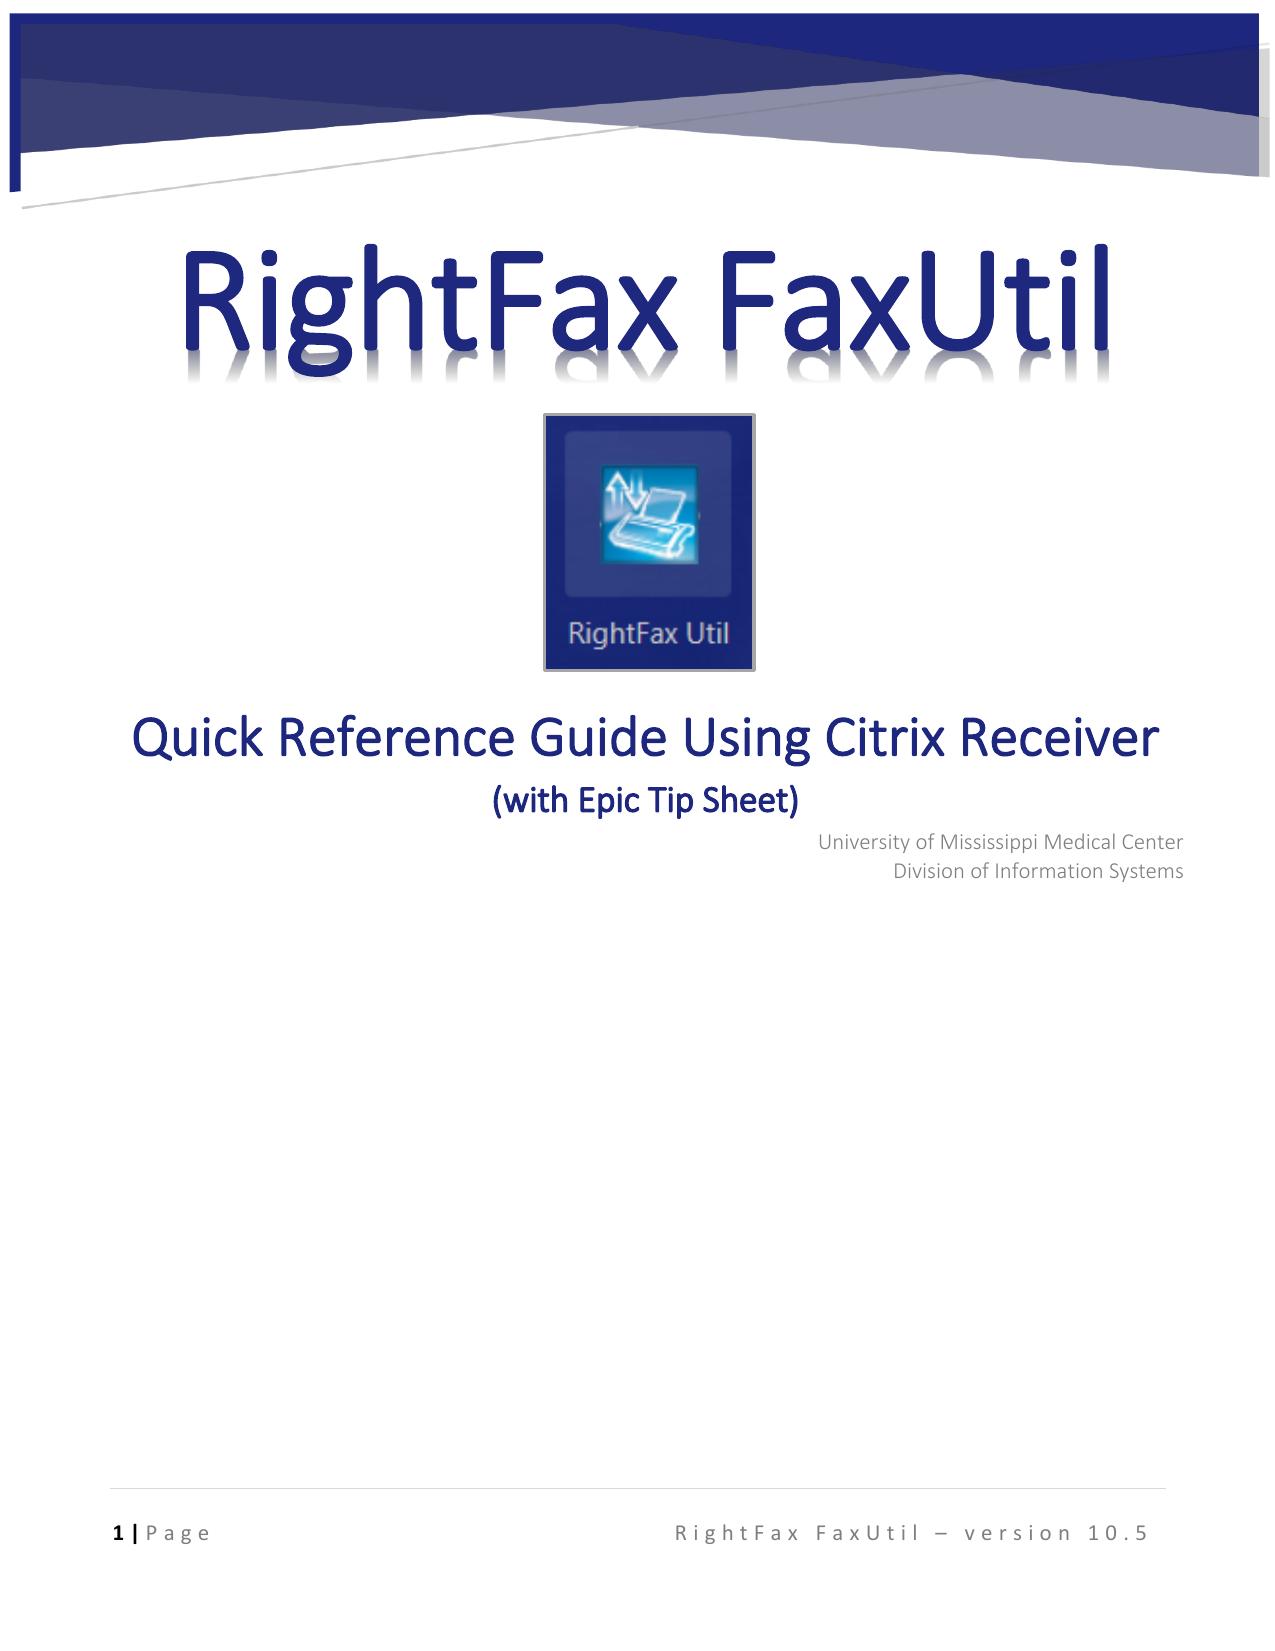 RightFax Instructions through Citrix | manualzz com